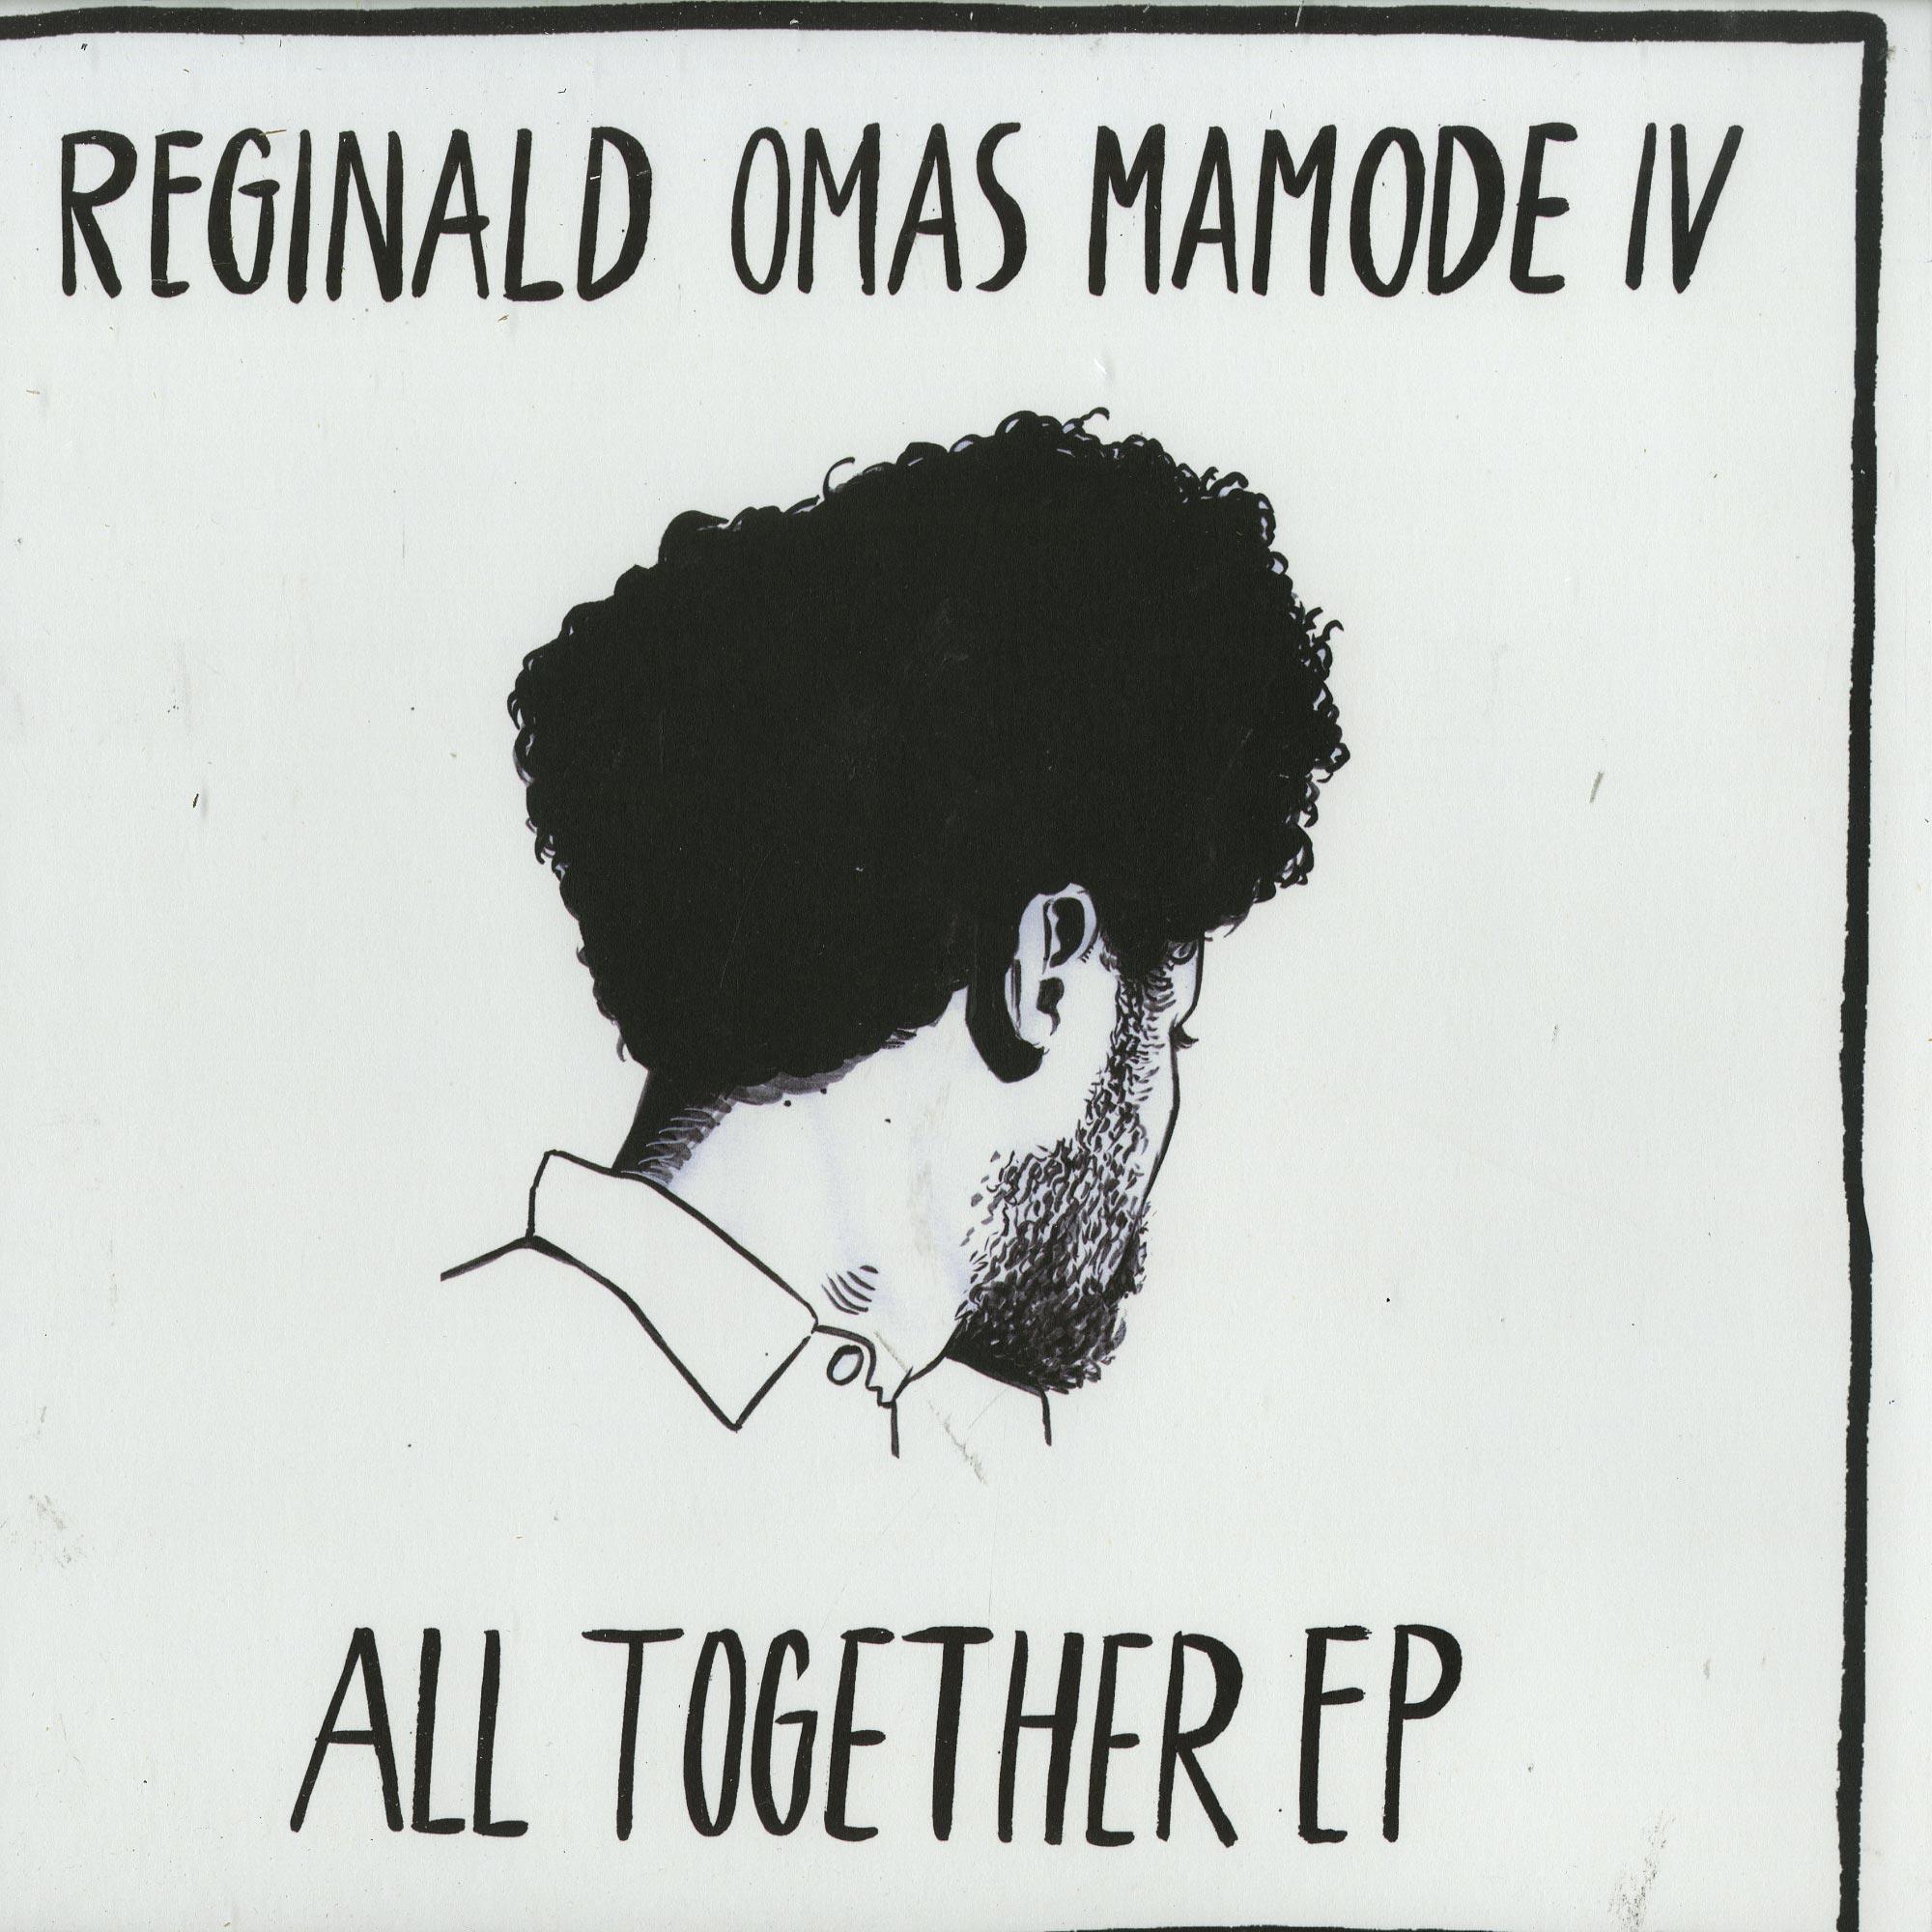 Reginald Omas Mamode IV - ALL TOGETHER